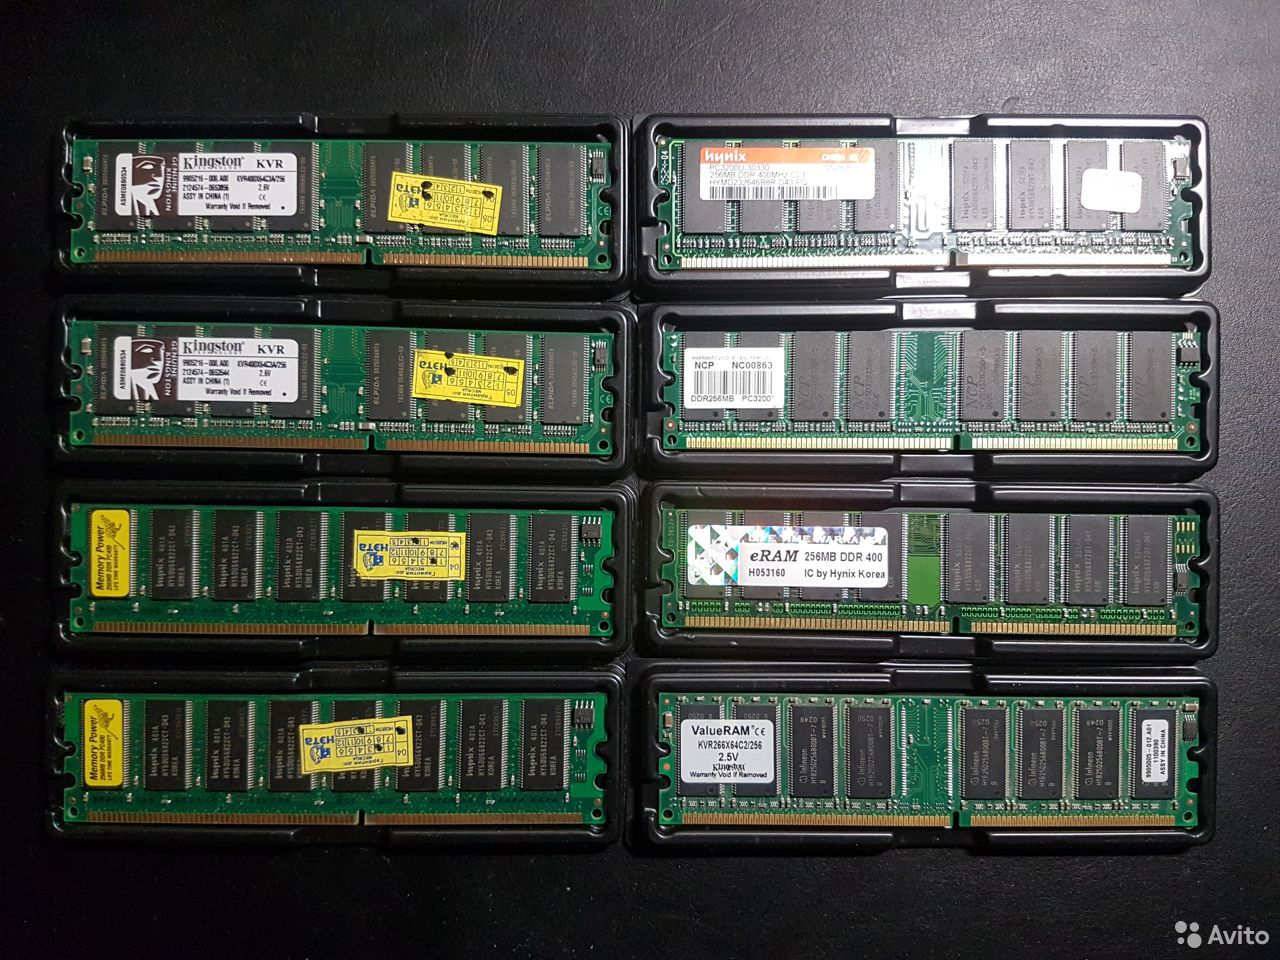 Память dimm DDR1 Kingston, Hynix, NCP и другие